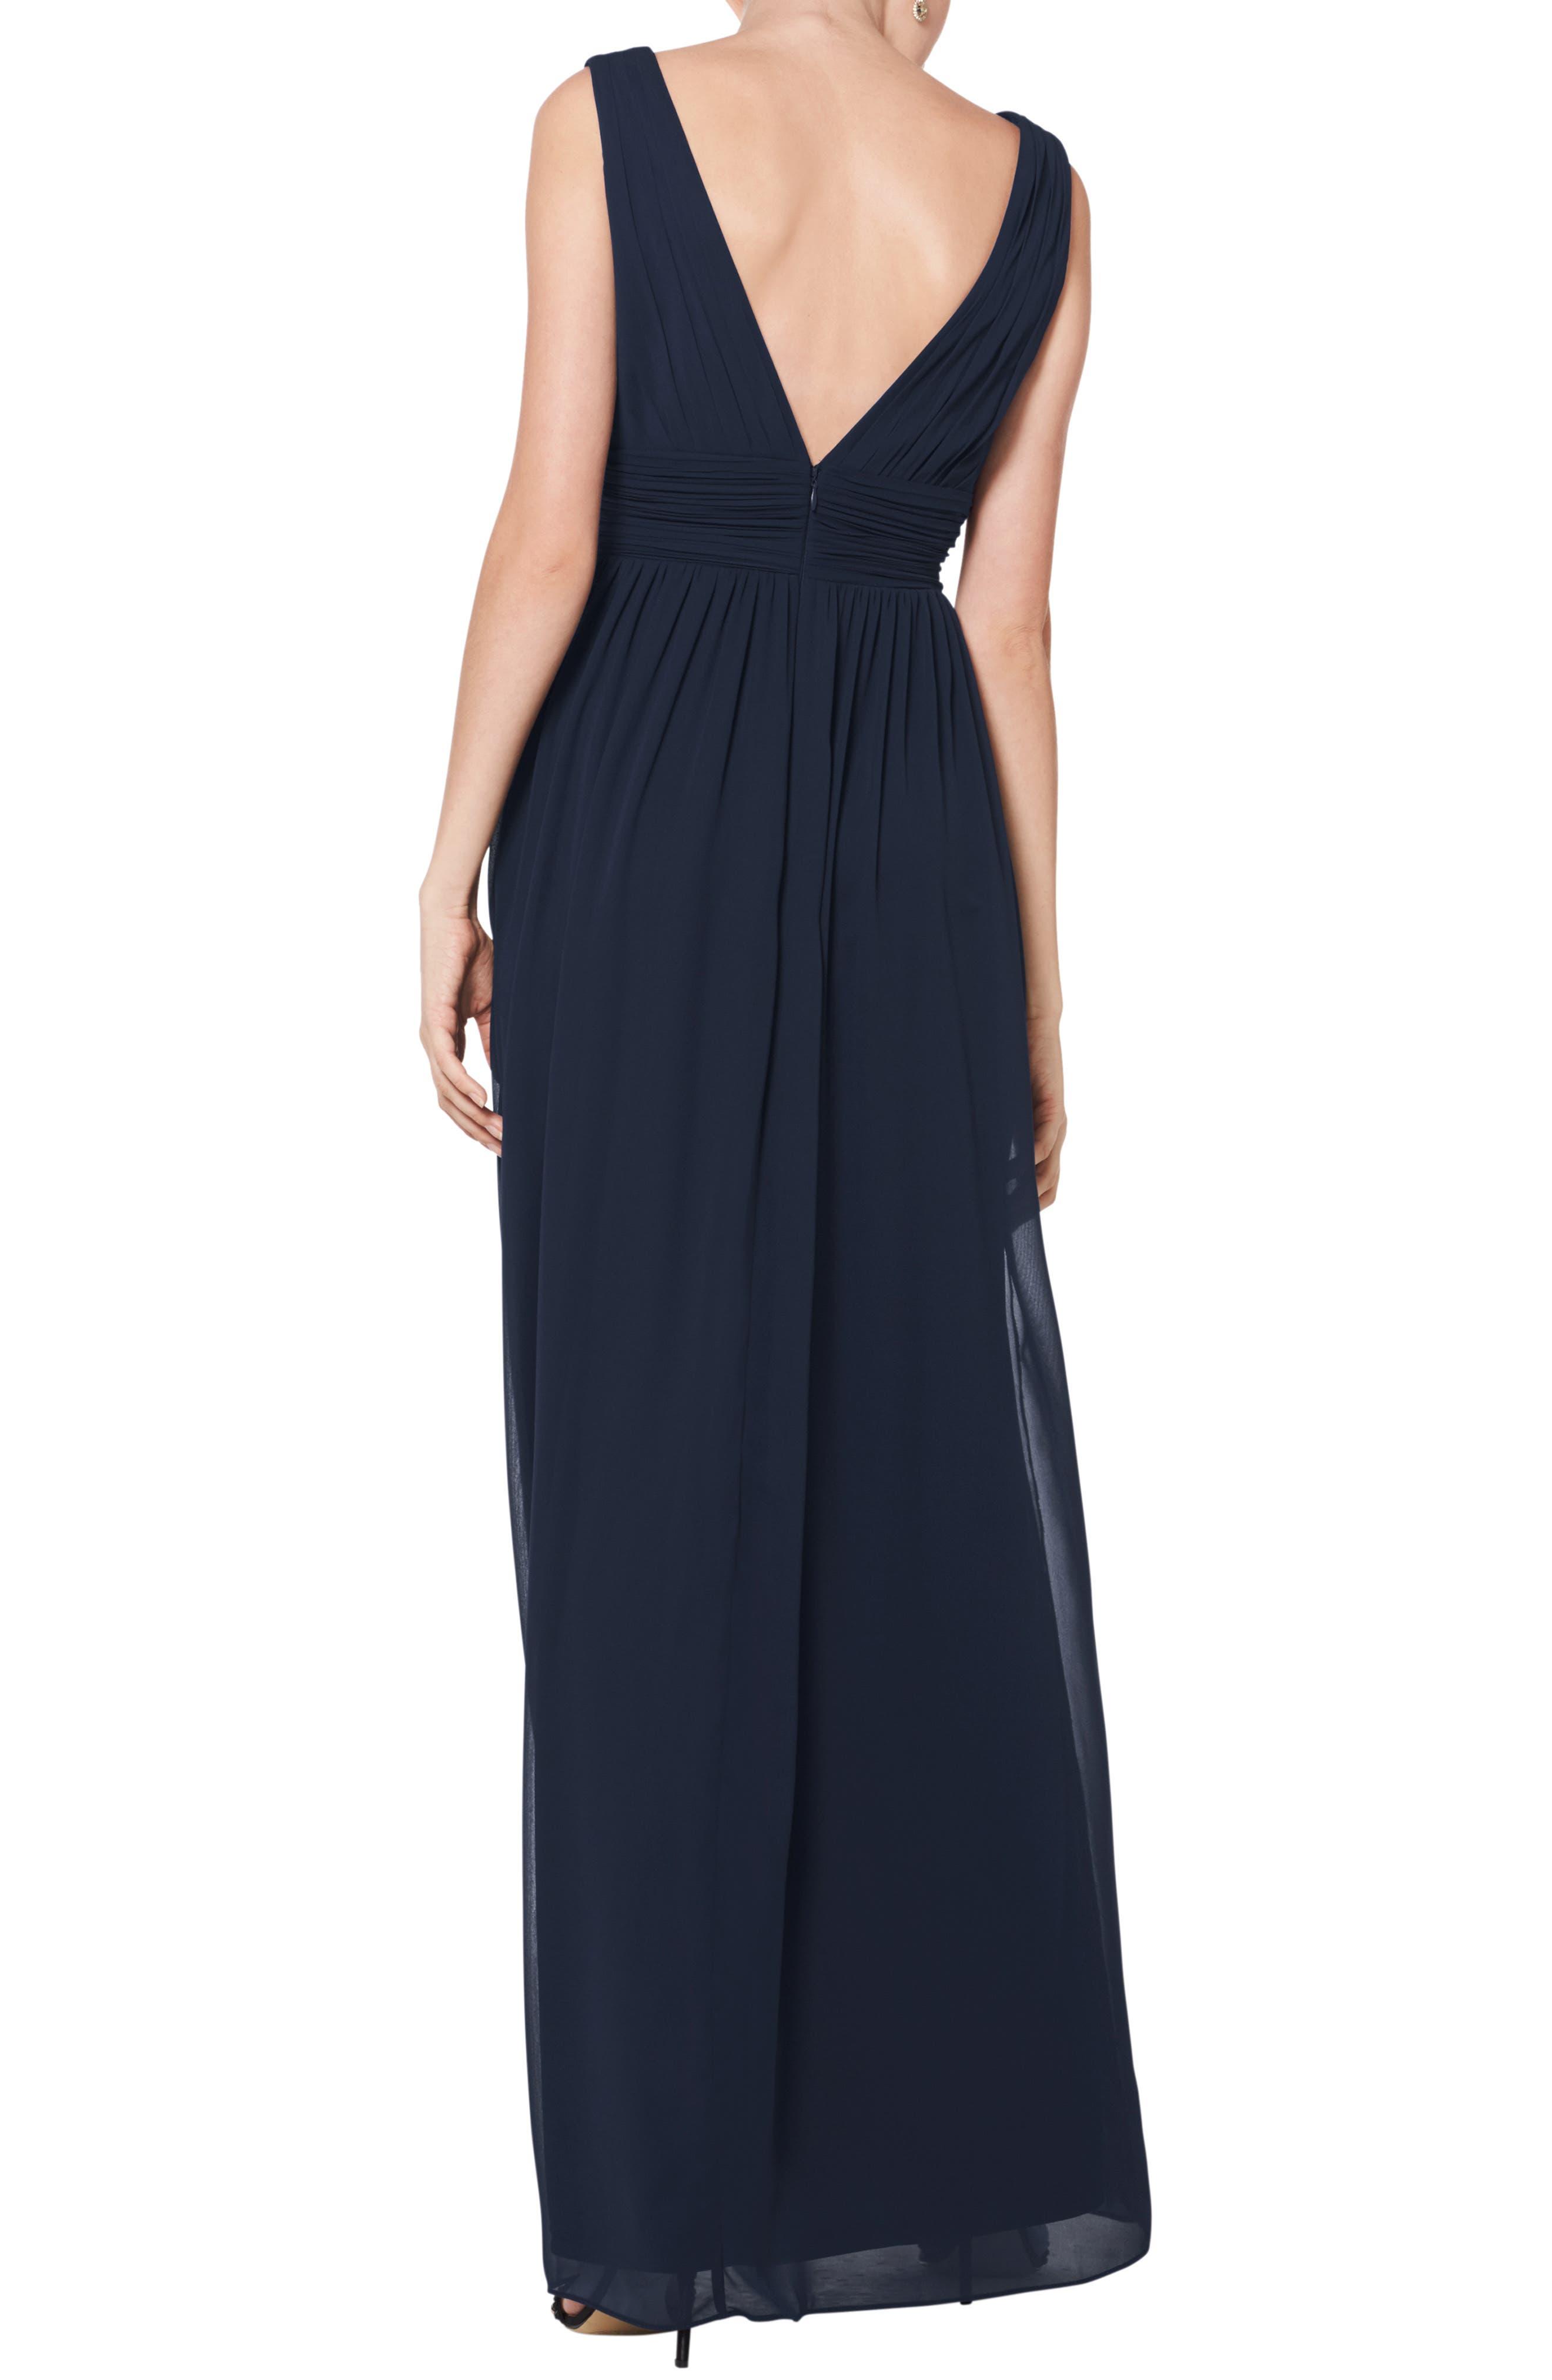 #LEVKOFF, V-Neck Pleated Chiffon Evening Dress, Alternate thumbnail 2, color, NAVY